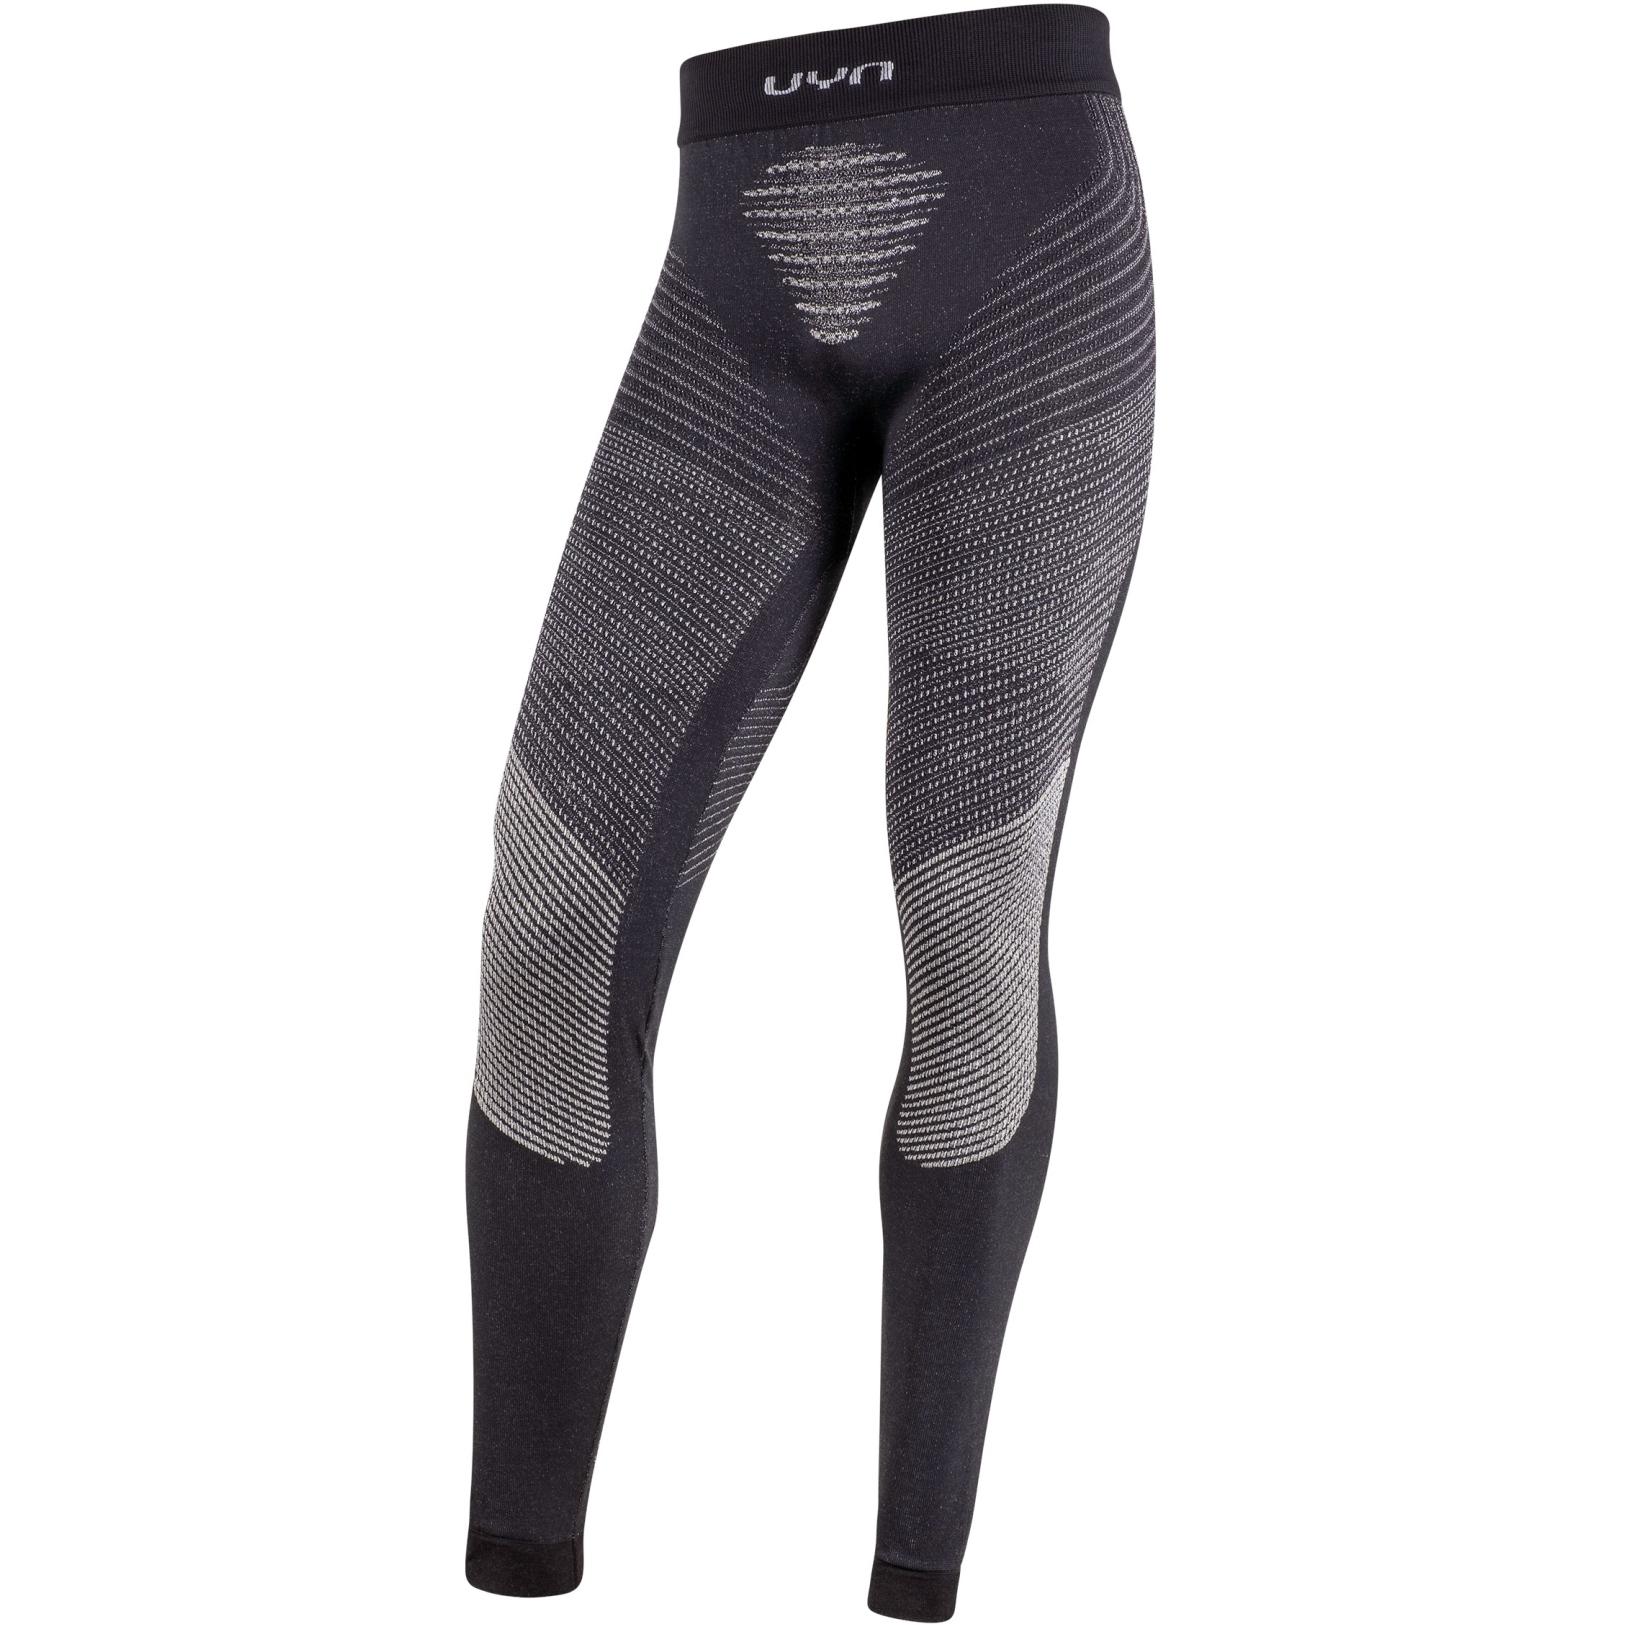 Image of UYN Cashmere Shiny 2.0 Man Underwear Pants Long - Celebrity Silver